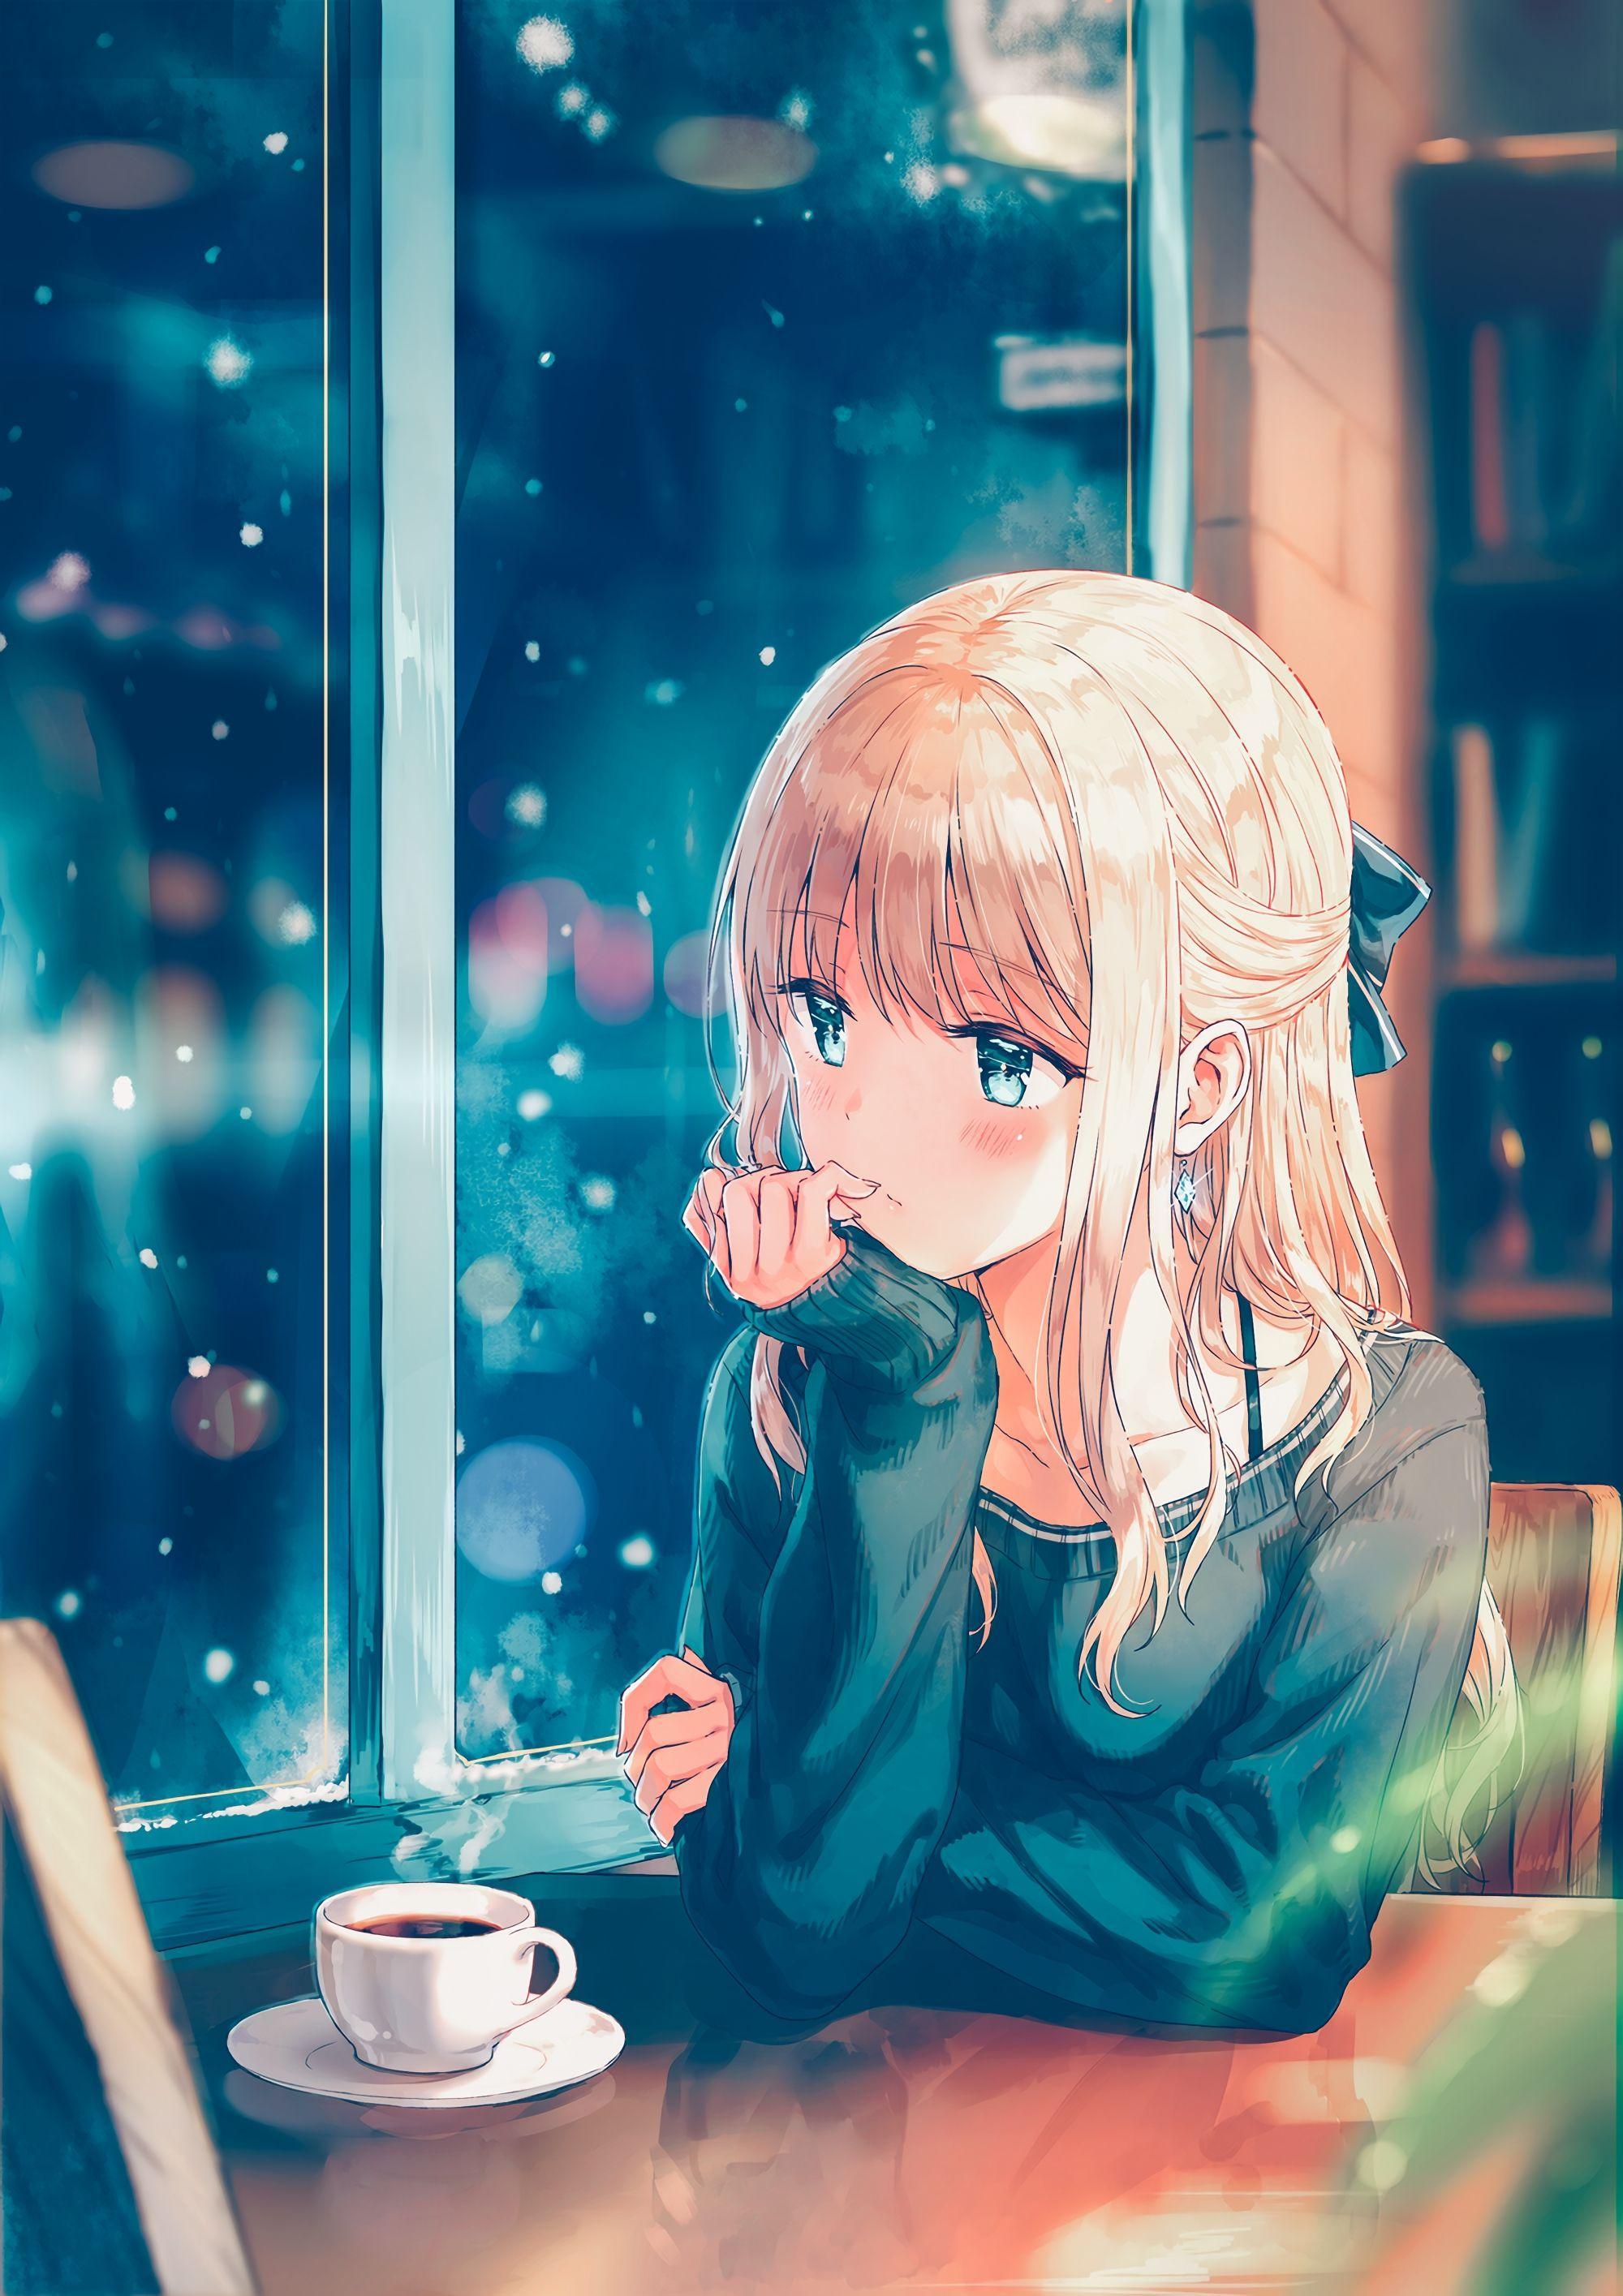 Anime Girl Phone Wallpaper : anime, phone, wallpaper, Anime, Phone, Wallpapers, Wallpaper